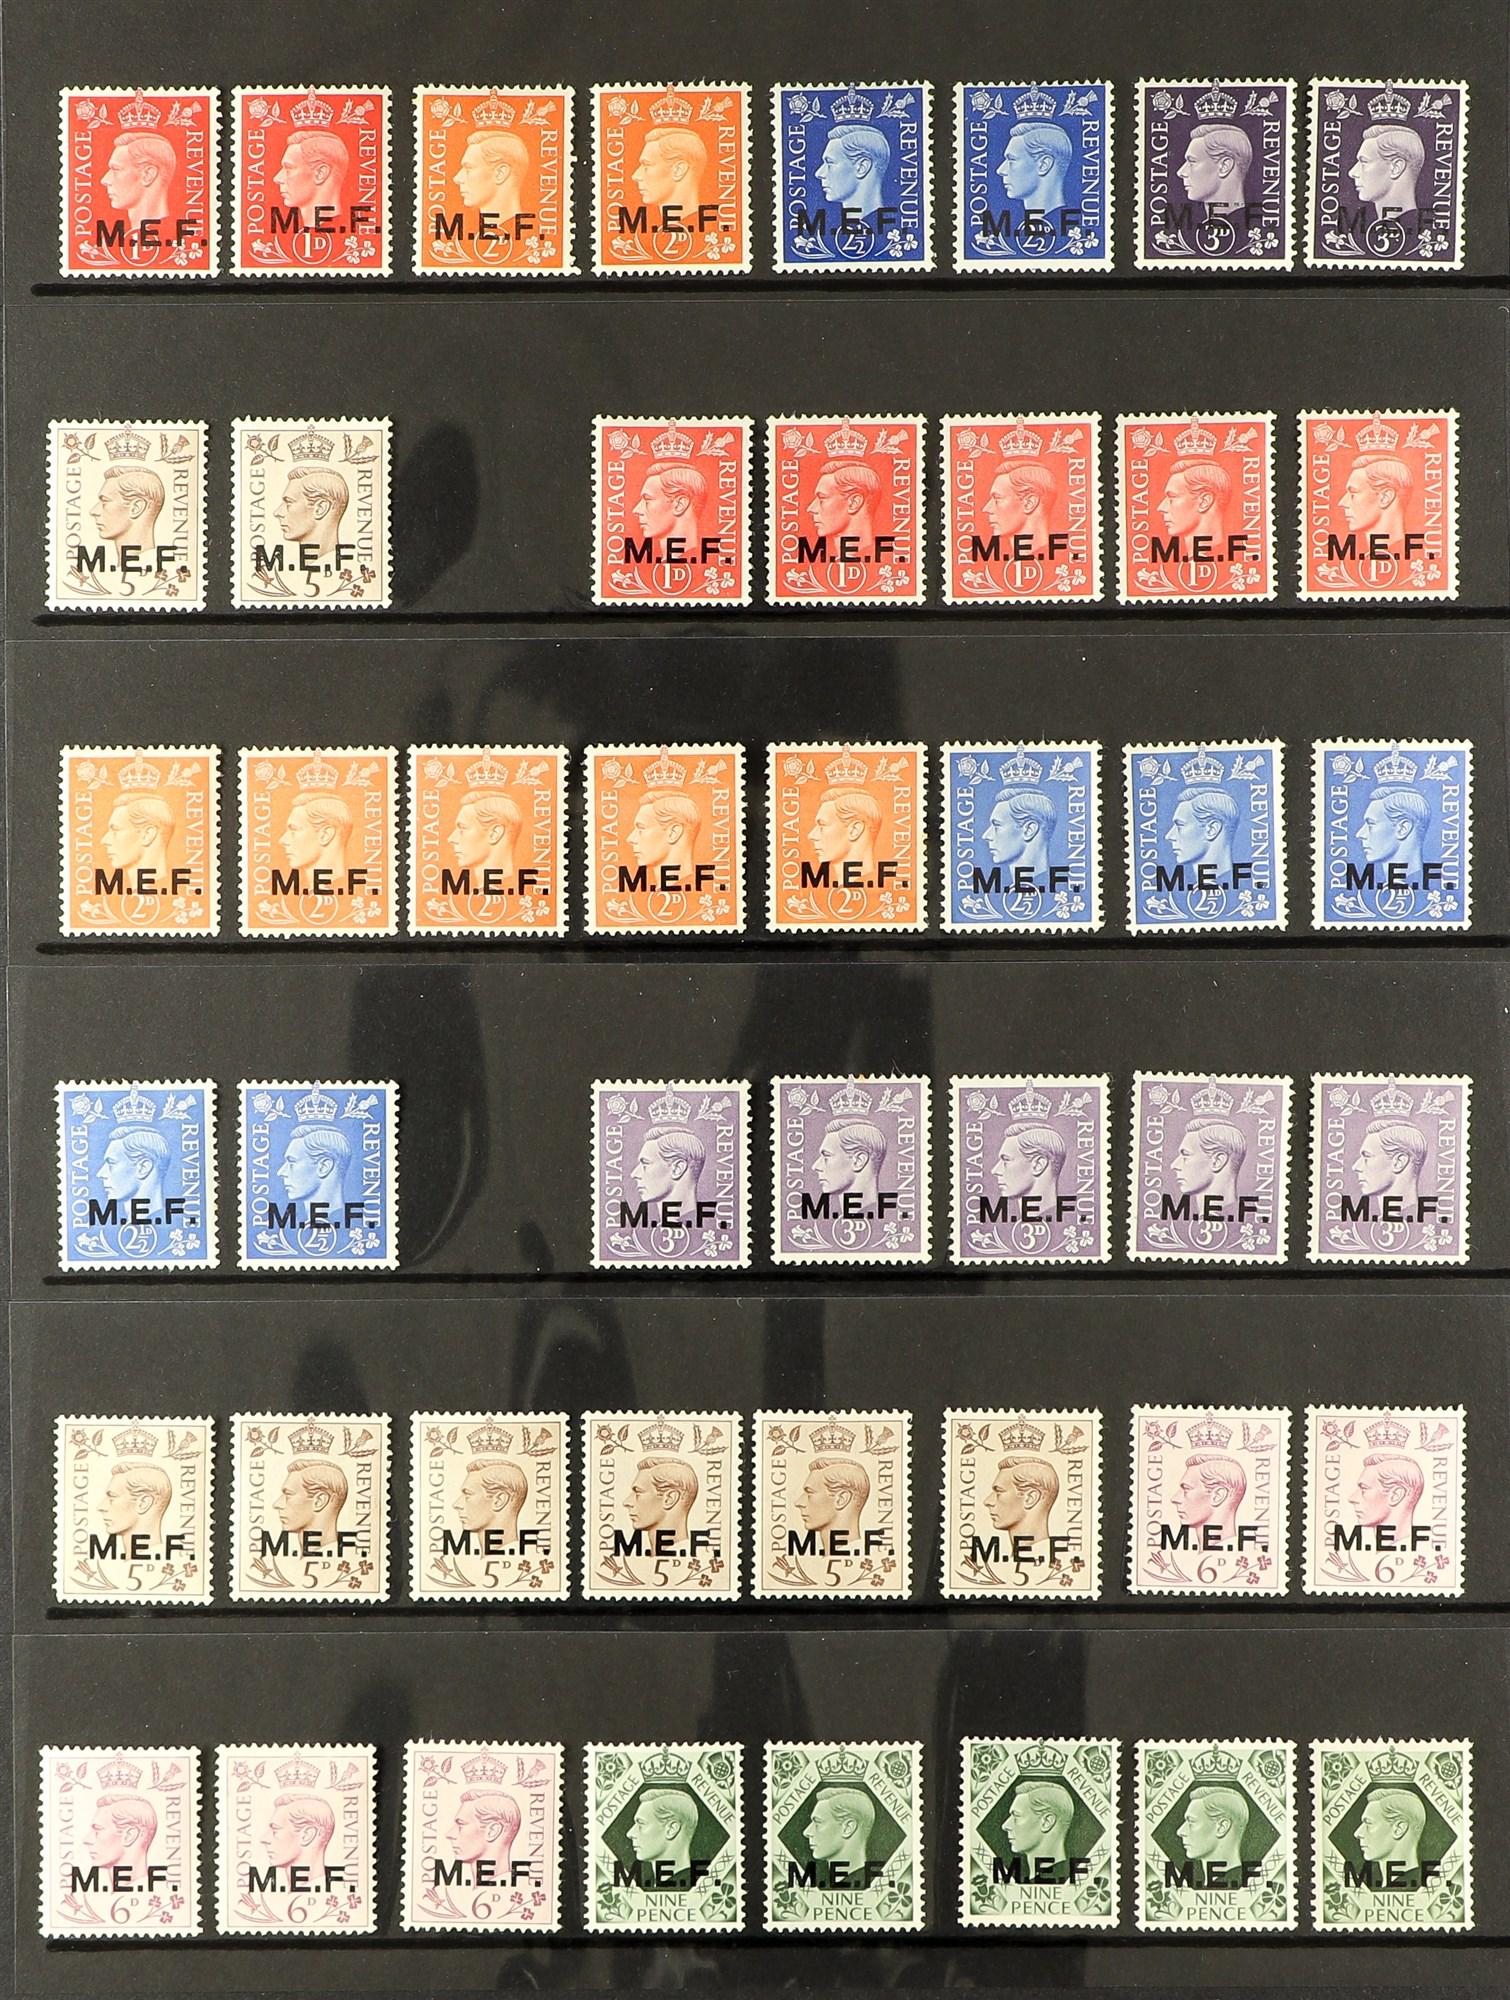 BR. OCC. ITAL. COL. M.E.F. 1942-47 mint range incl. 1942 sets x2, 1943-47 sets x5 & 1942 Postage due - Image 2 of 2